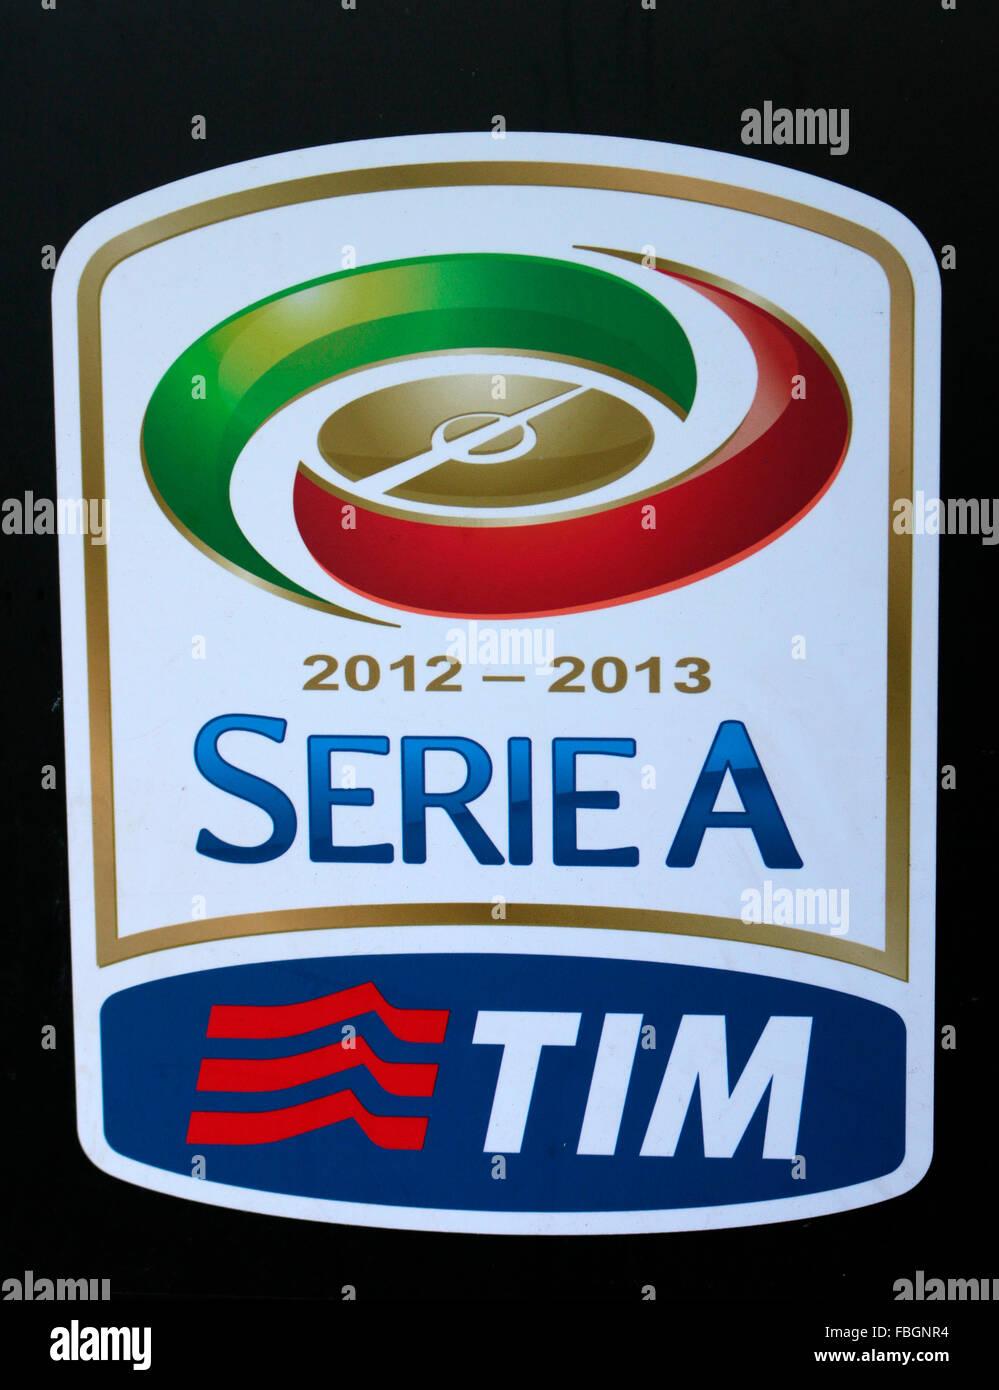 das Logo der Marke 'Serie A', Berlin. - Stock Image